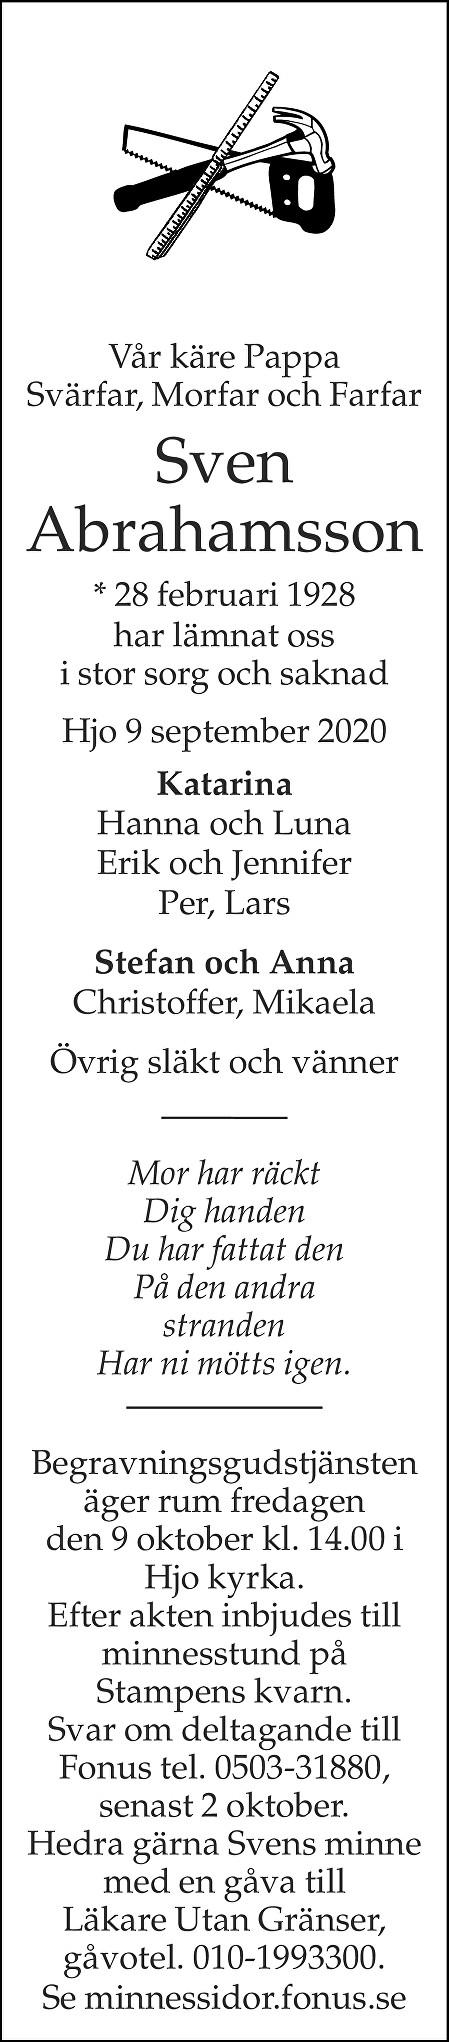 Sven Abrahamsson Death notice